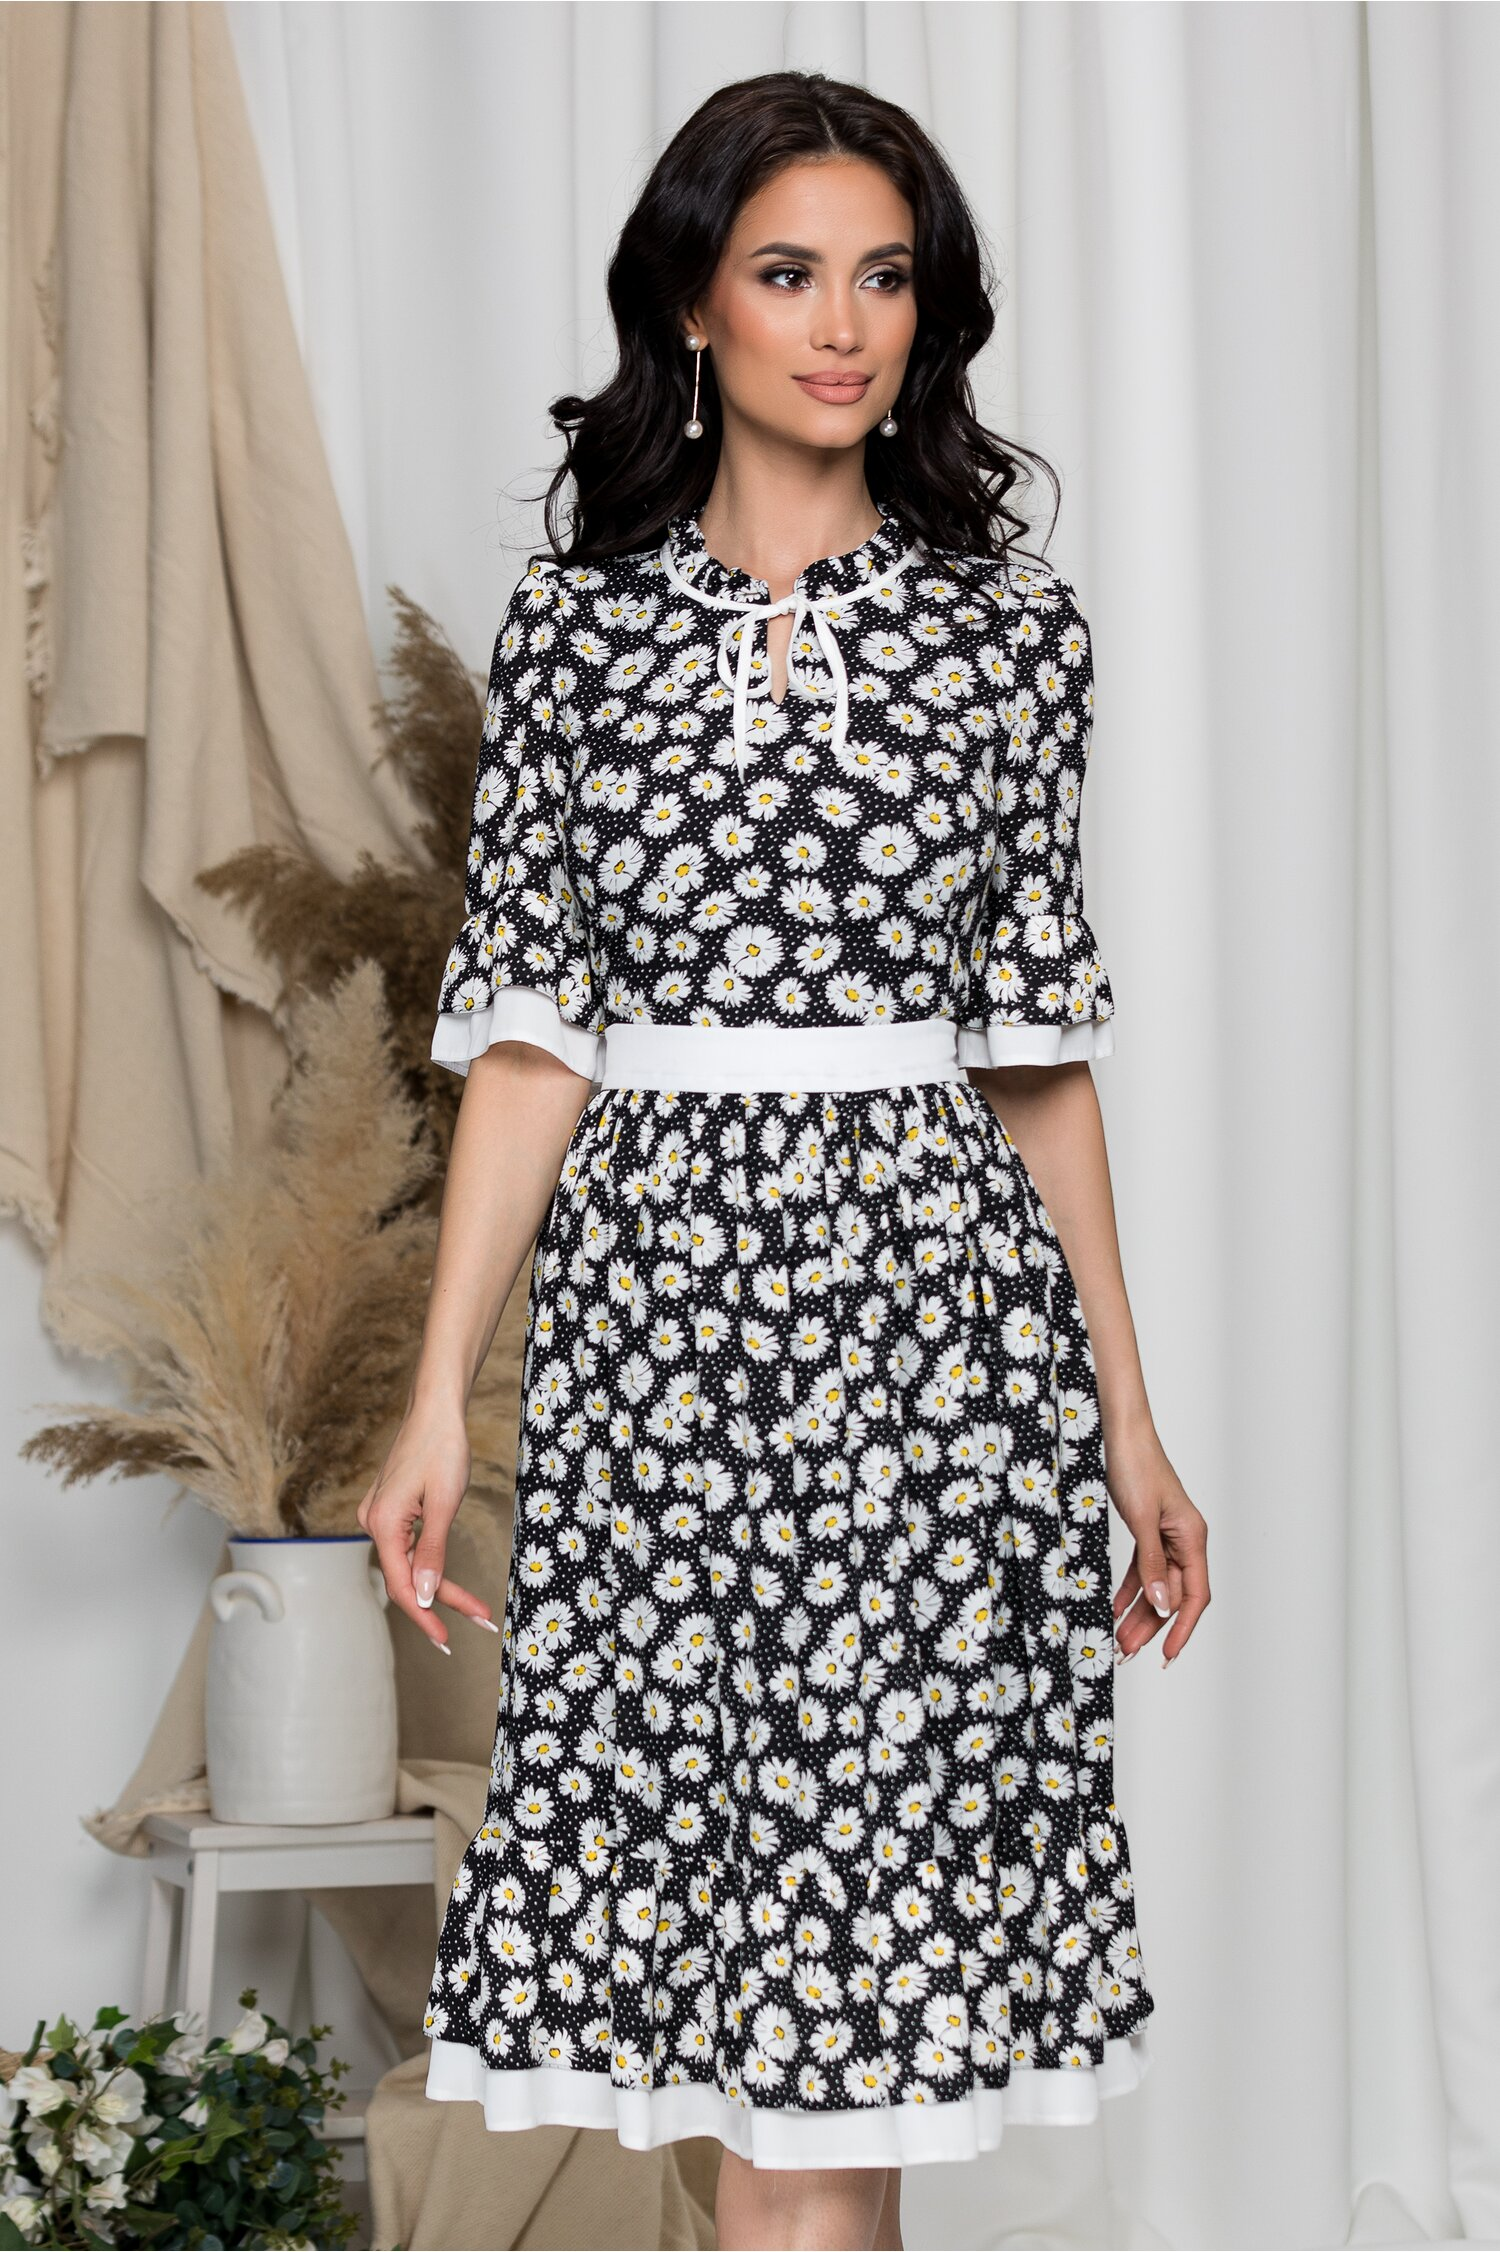 Rochie Daisy neagra cu buline si flori albe imagine dyfashion.ro 2021